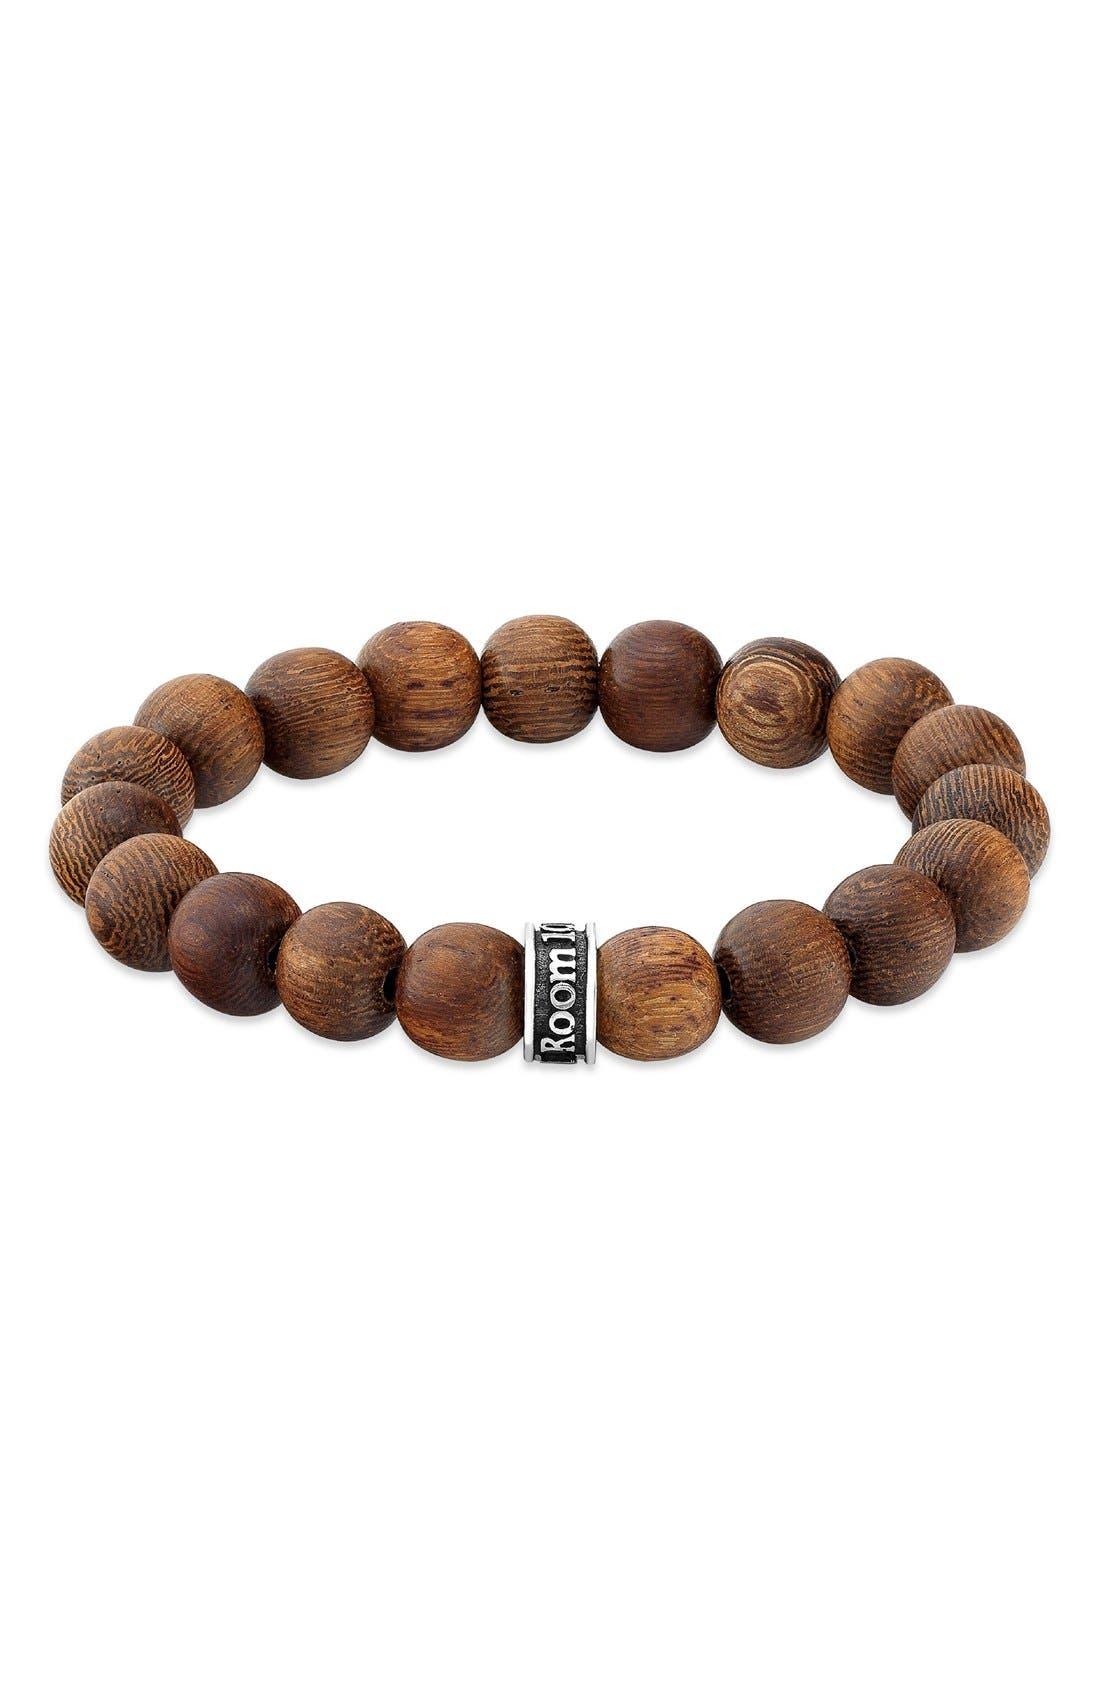 Wood Bead Bracelet,                             Main thumbnail 1, color,                             BROWN